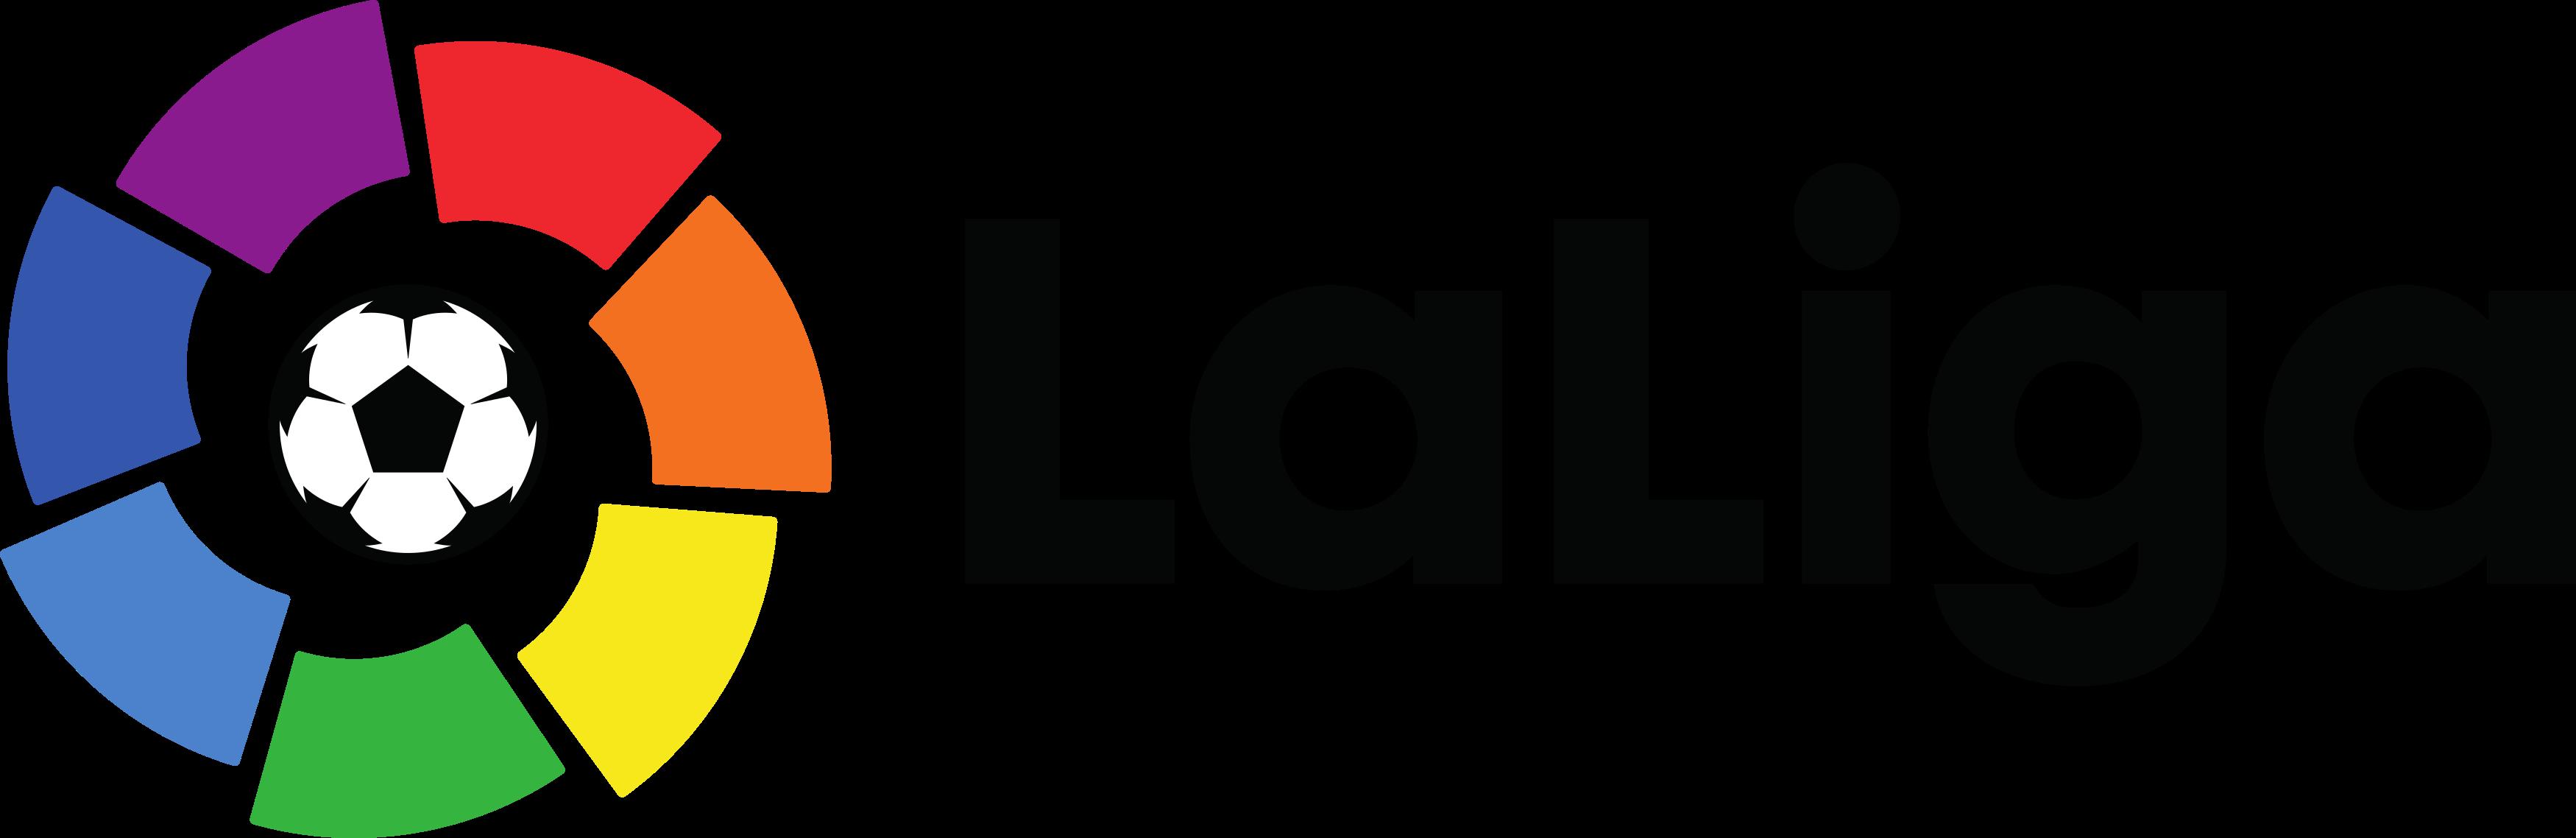 laliga logo 1 - LaLiga Logo – Campeonato Español de Fútbol